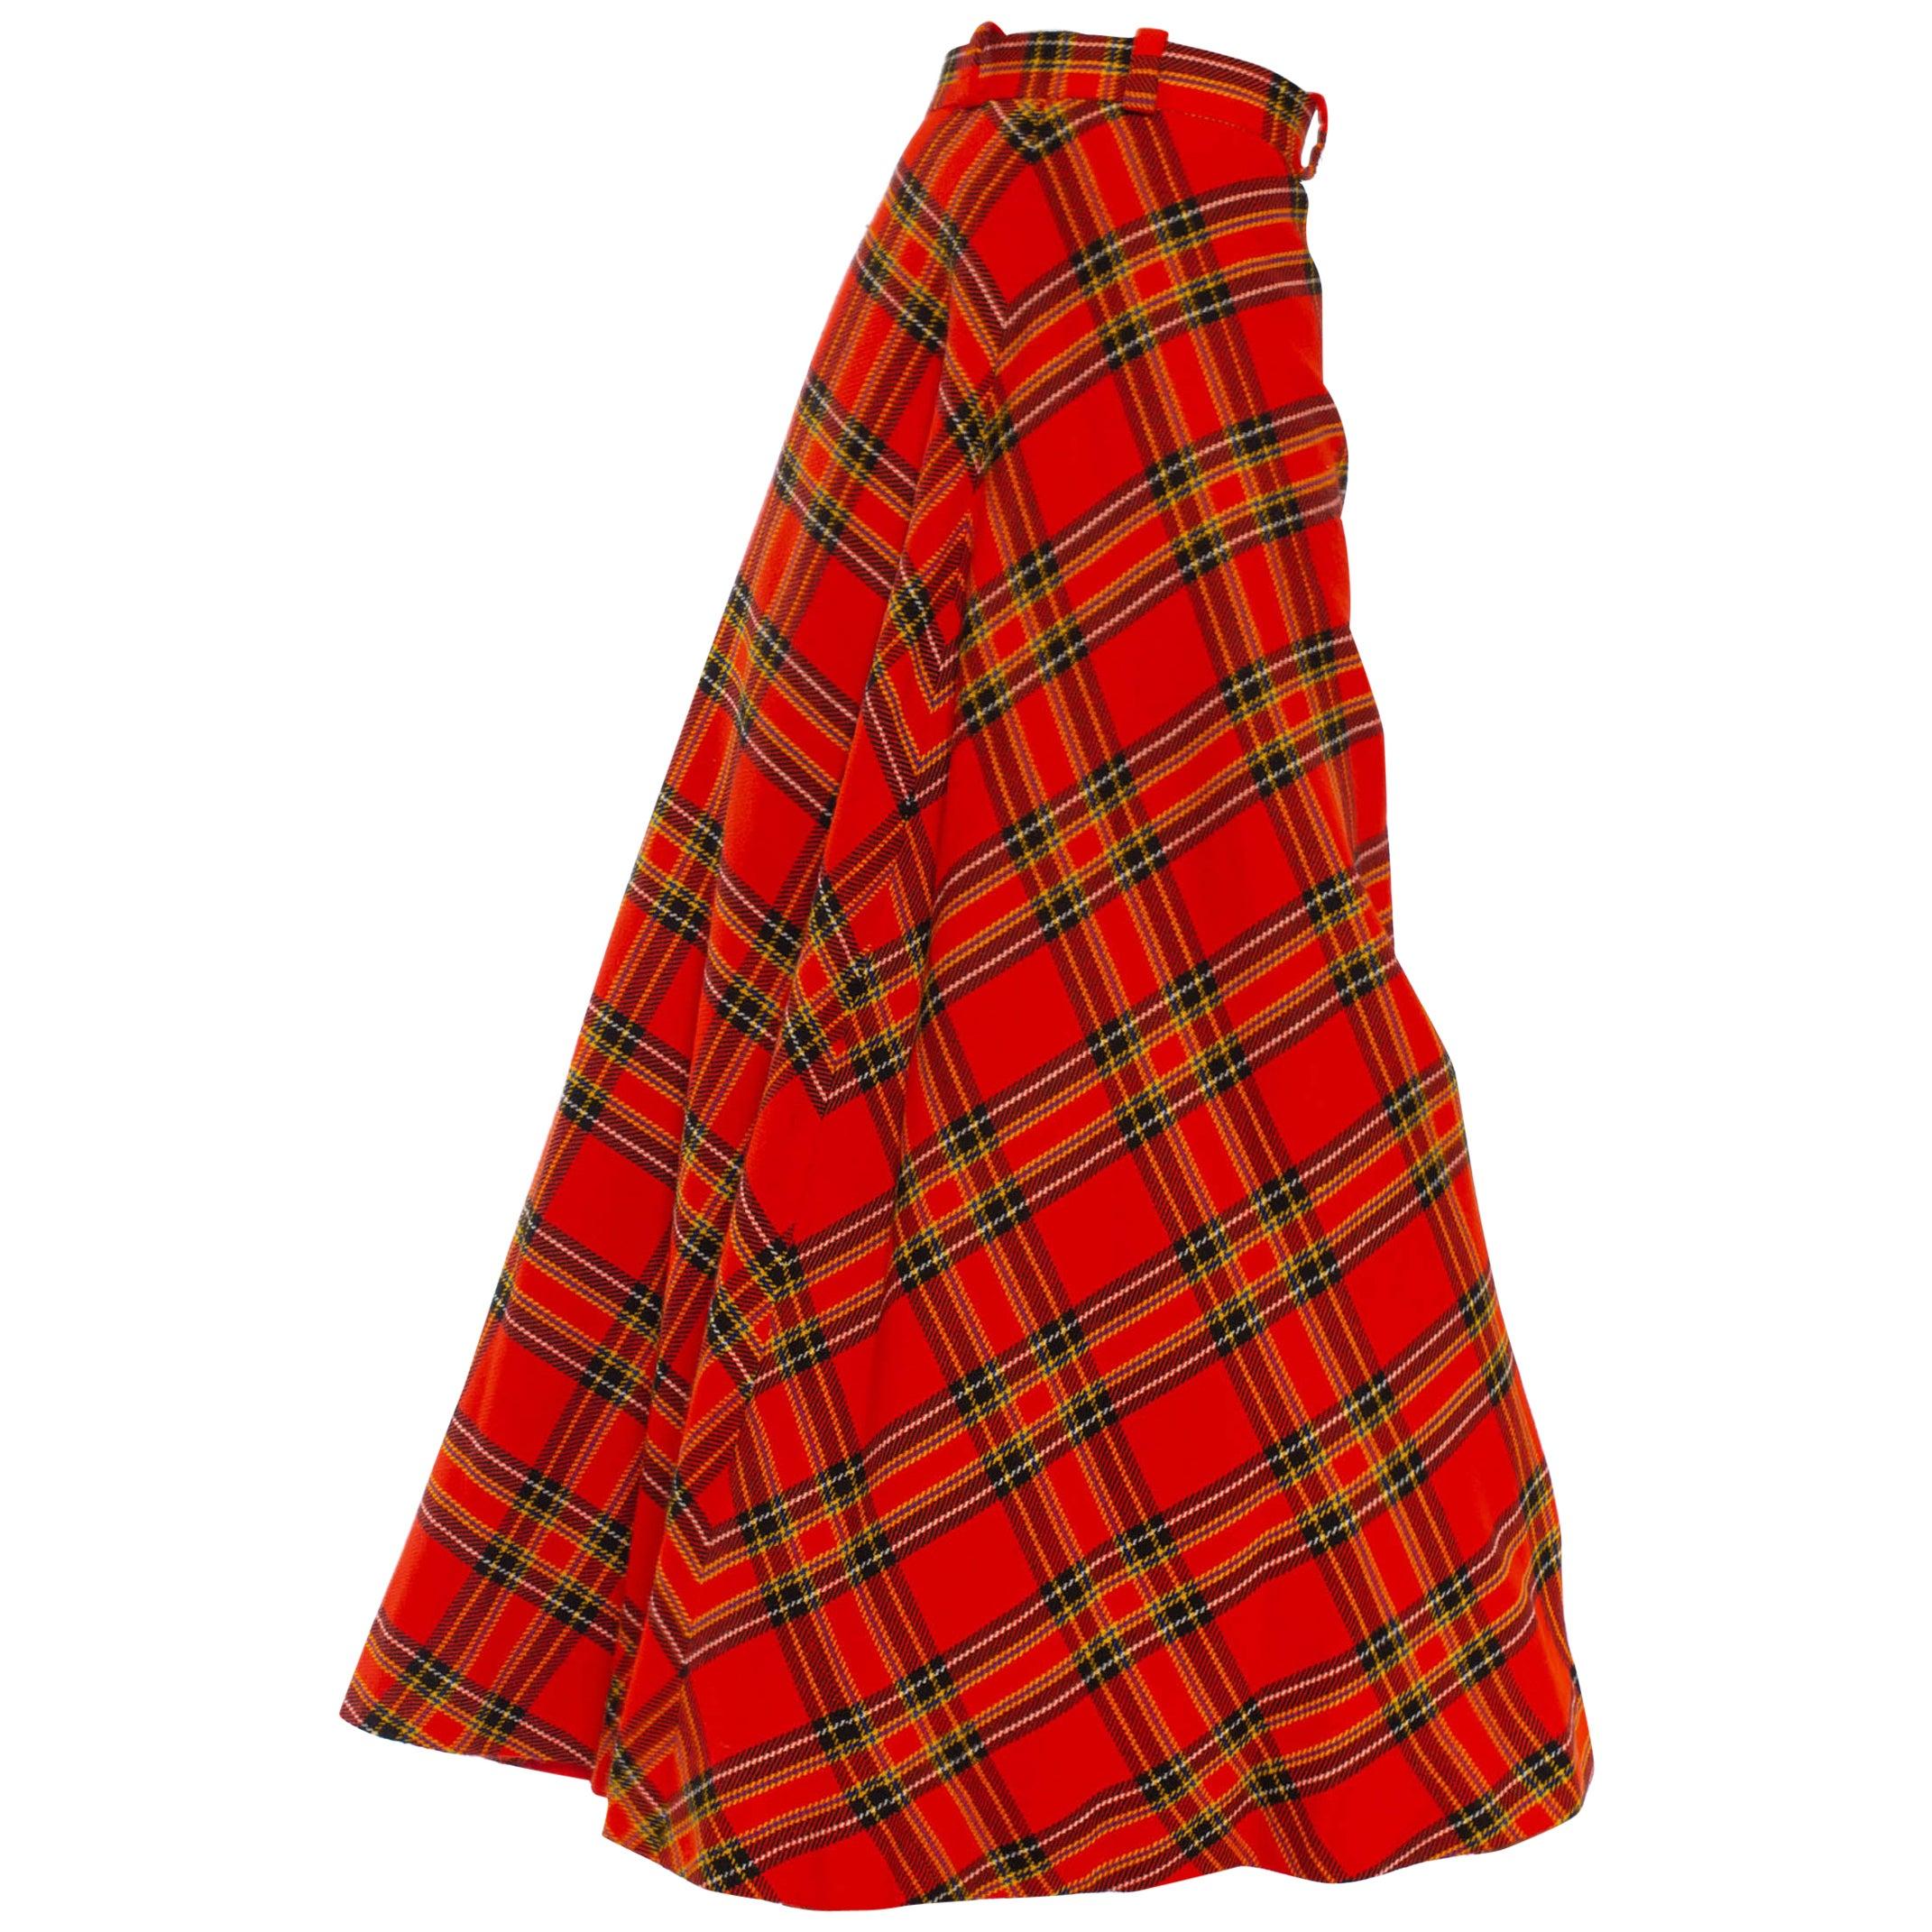 1970S Black & Red Wool Blend Tartan Bias Cut Maxi Skirt